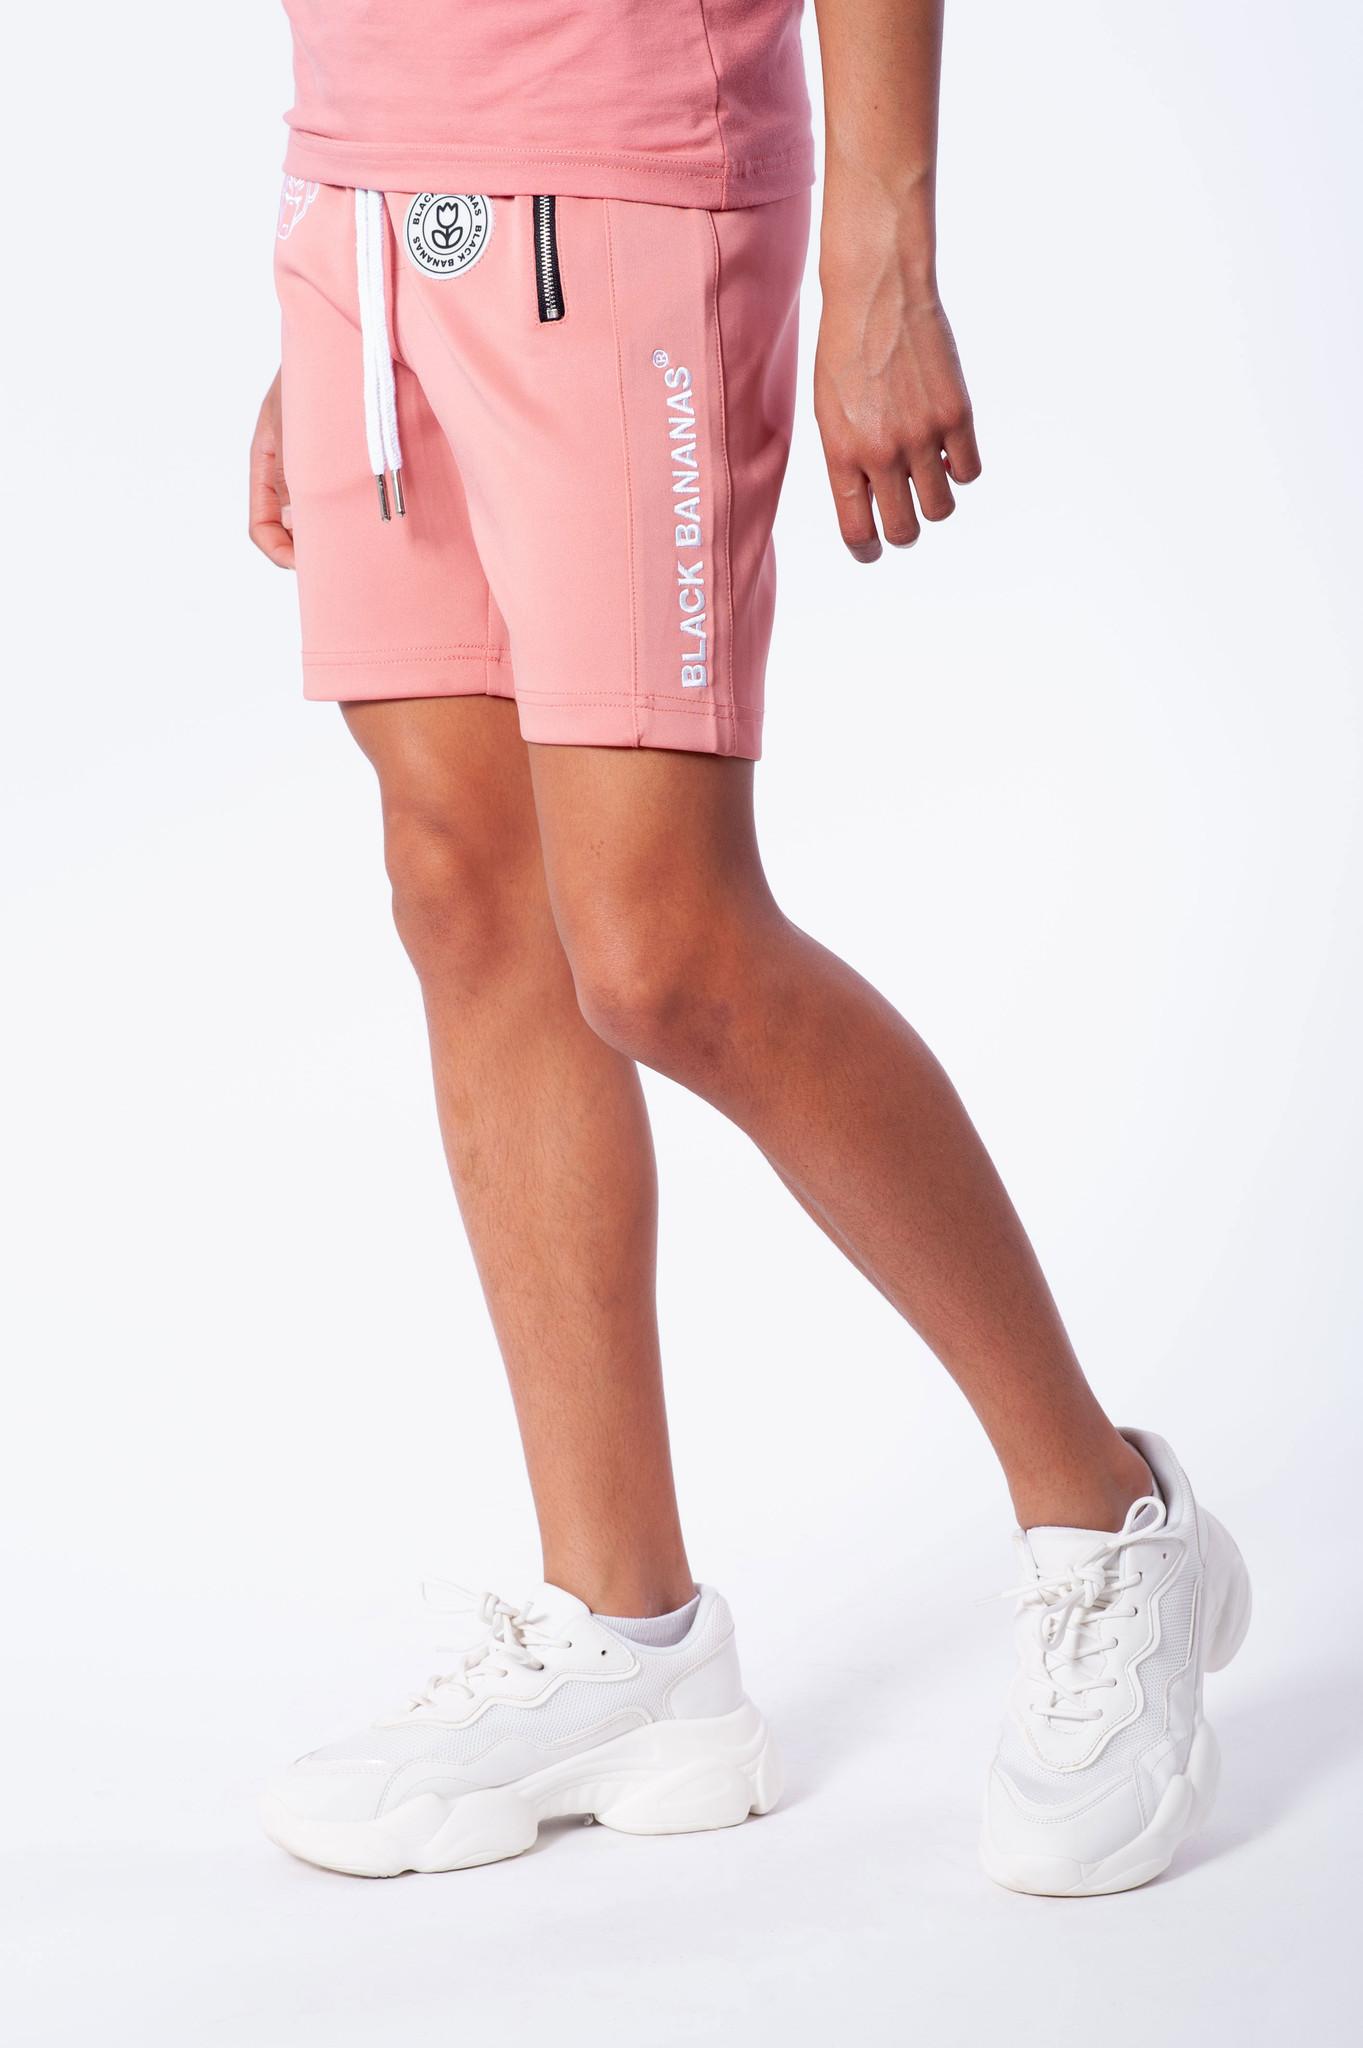 Jr. F.C Basic Short Pink-2